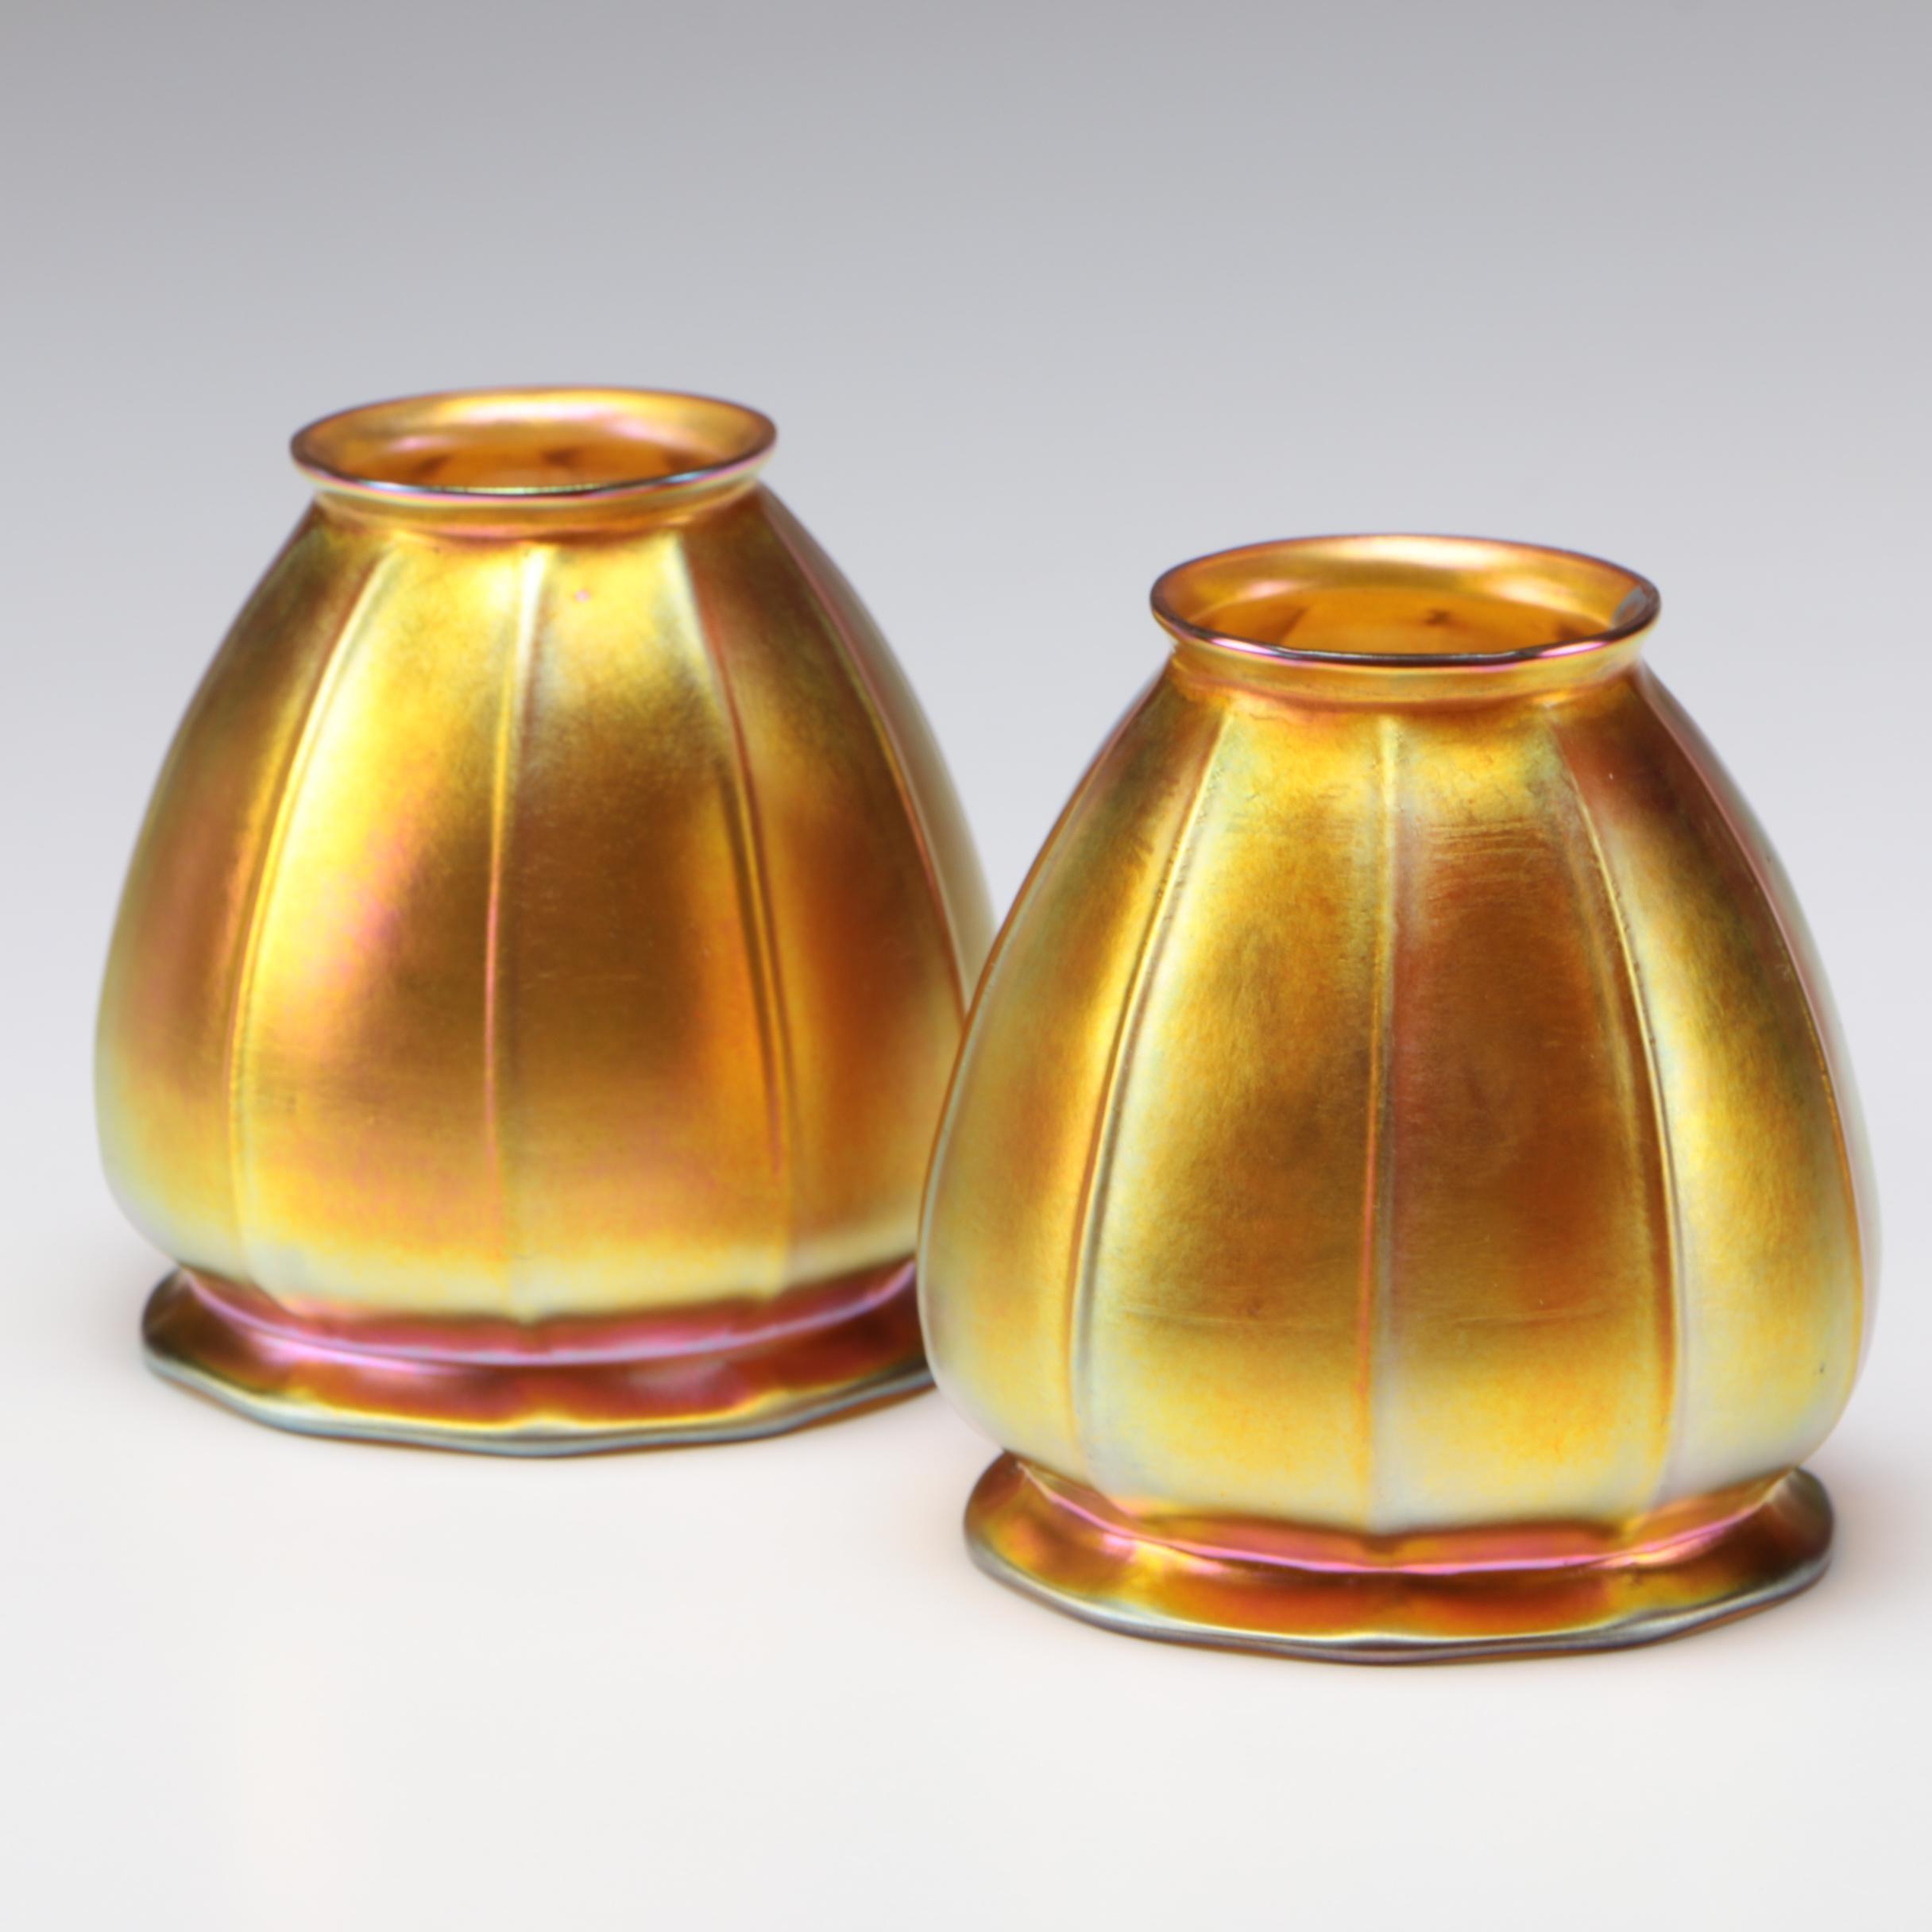 Steuben Gold Aurene Art Glass Shades Designed by Frederick Carder, 1903 - 1933